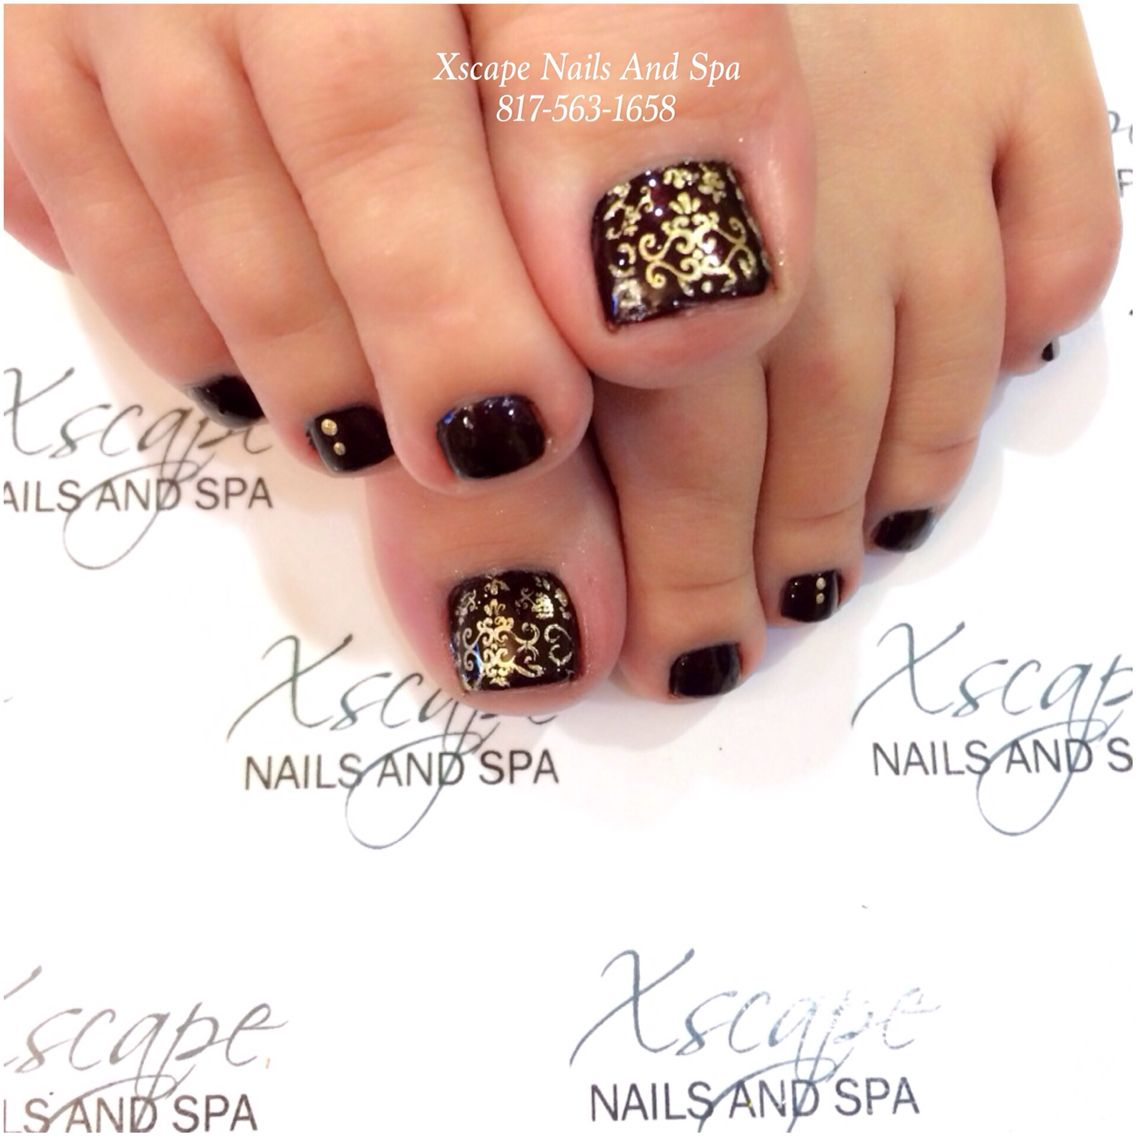 Pretty Pedicure Dark Burgundy Polish With A Very Intricate Gold Stencil Design Pedicure Nail Art Toe Nail Designs Pretty Pedicures